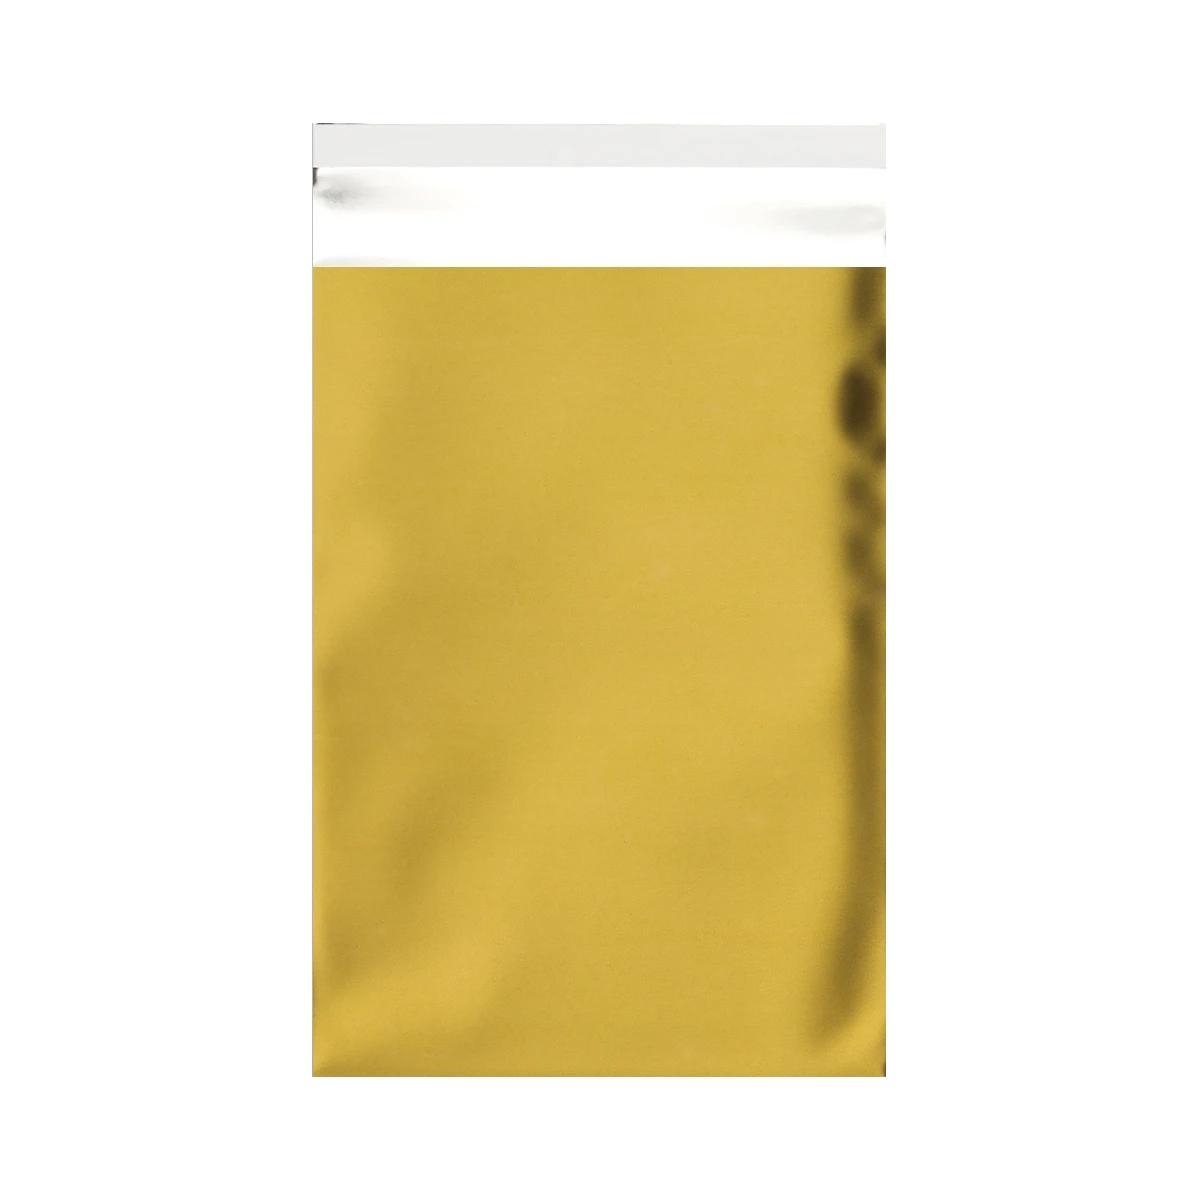 Mattfolierad påse Guld